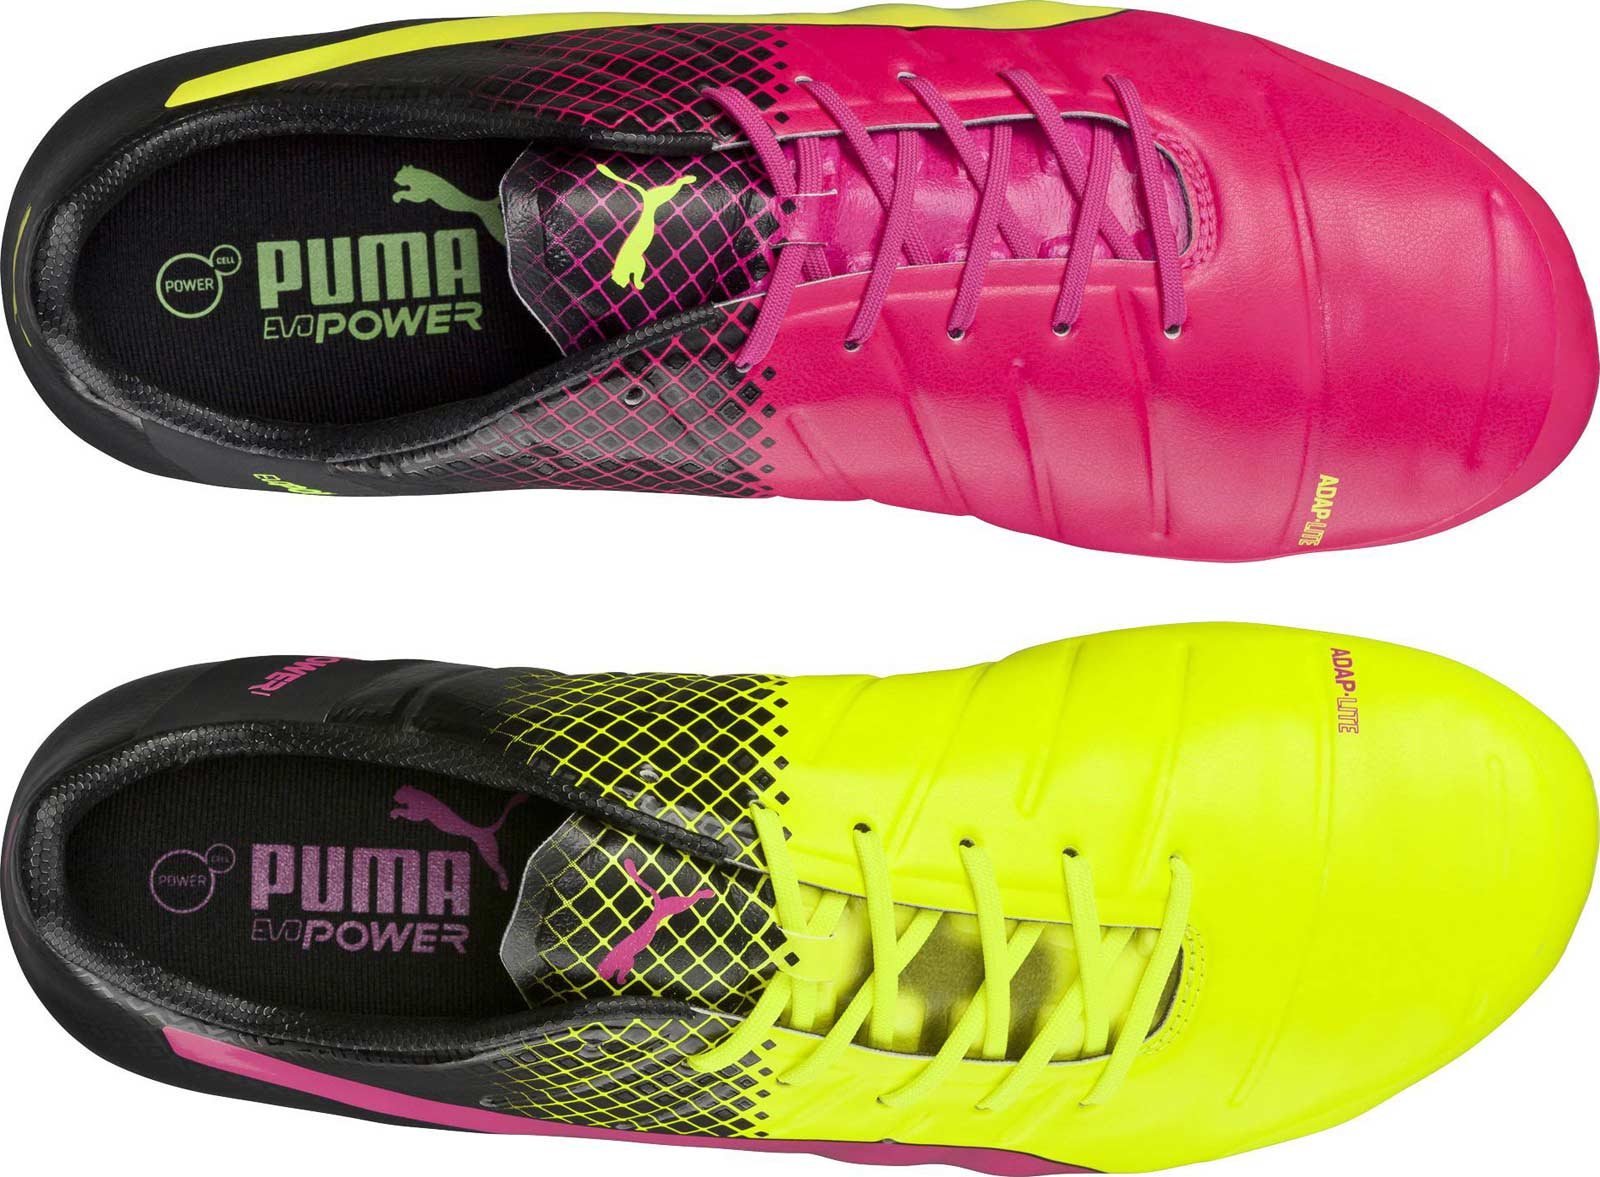 puma zwei verschiedene schuhe